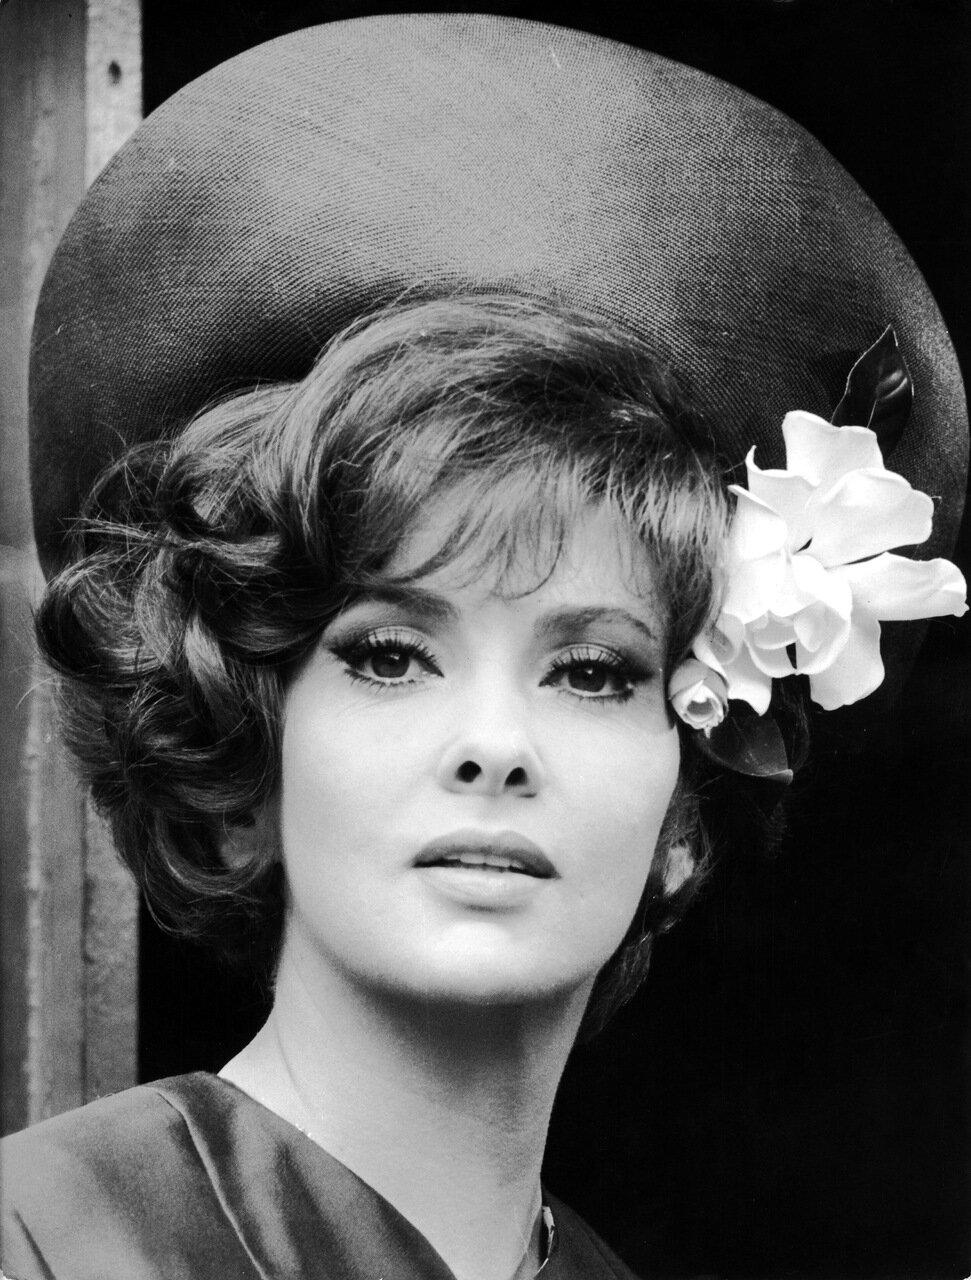 Gina LOLLOBRIGIDA Portrait mit Hut, 1966